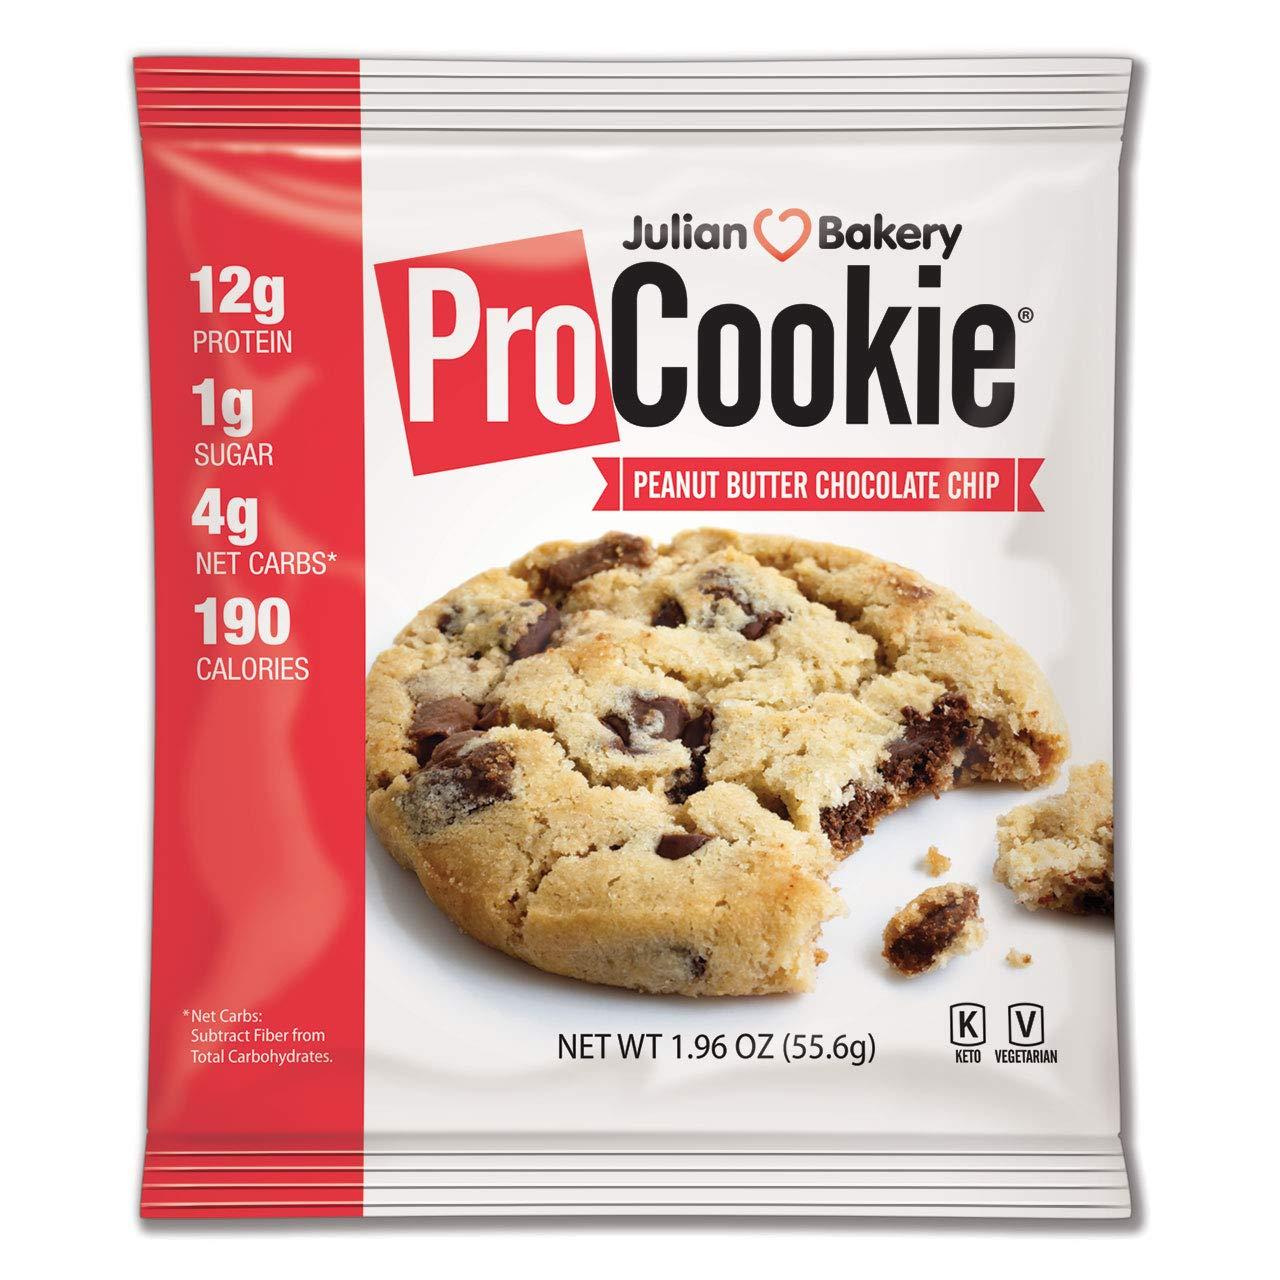 ProCookie Peanut Butter Chocolate Chip (4 Net Carbs)(Gluten-Free)(Grain-Free) (8 Keto Cookies) by Julian Bakery